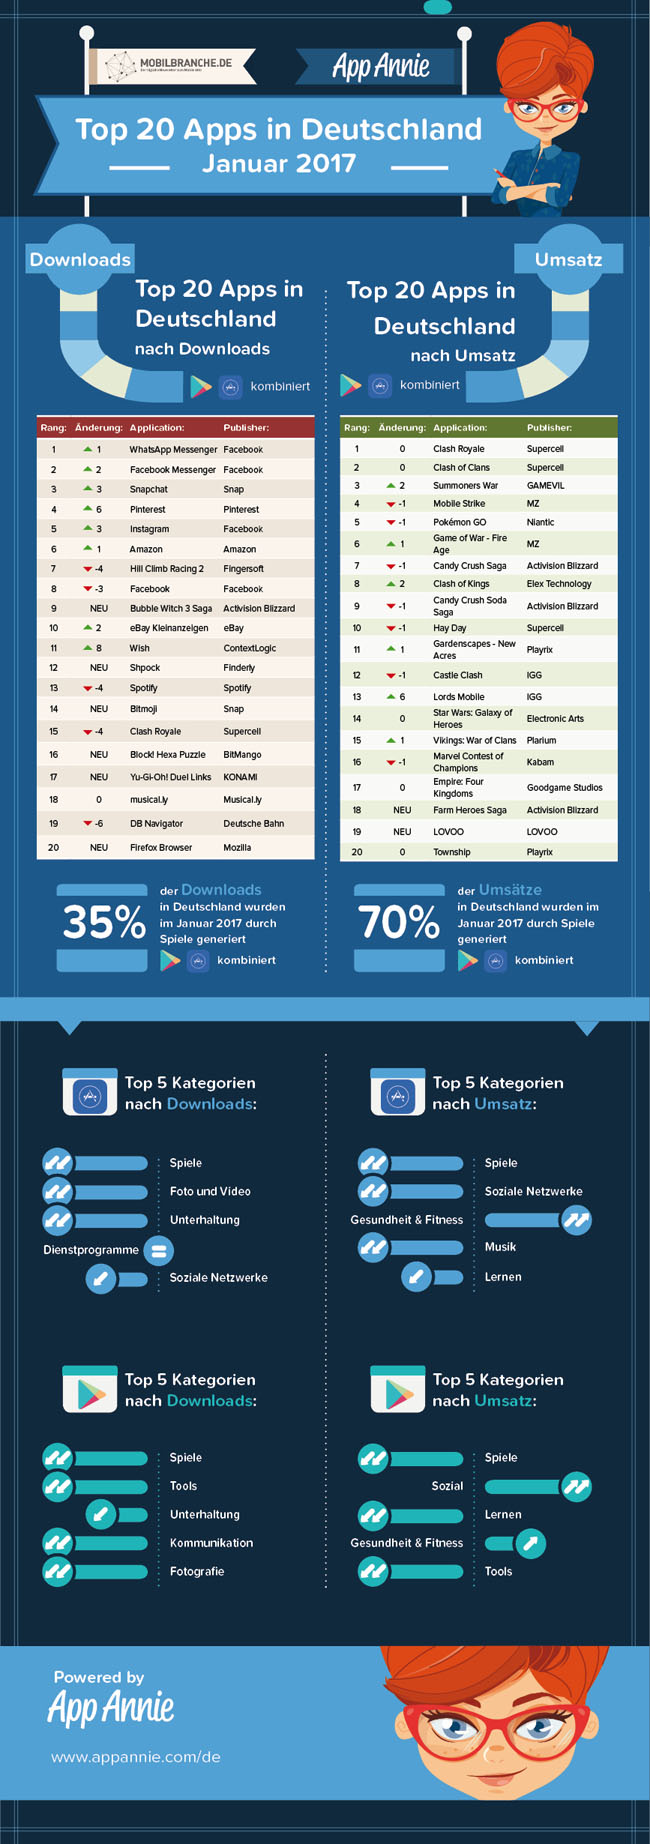 Top 20 Apps Januar 2017